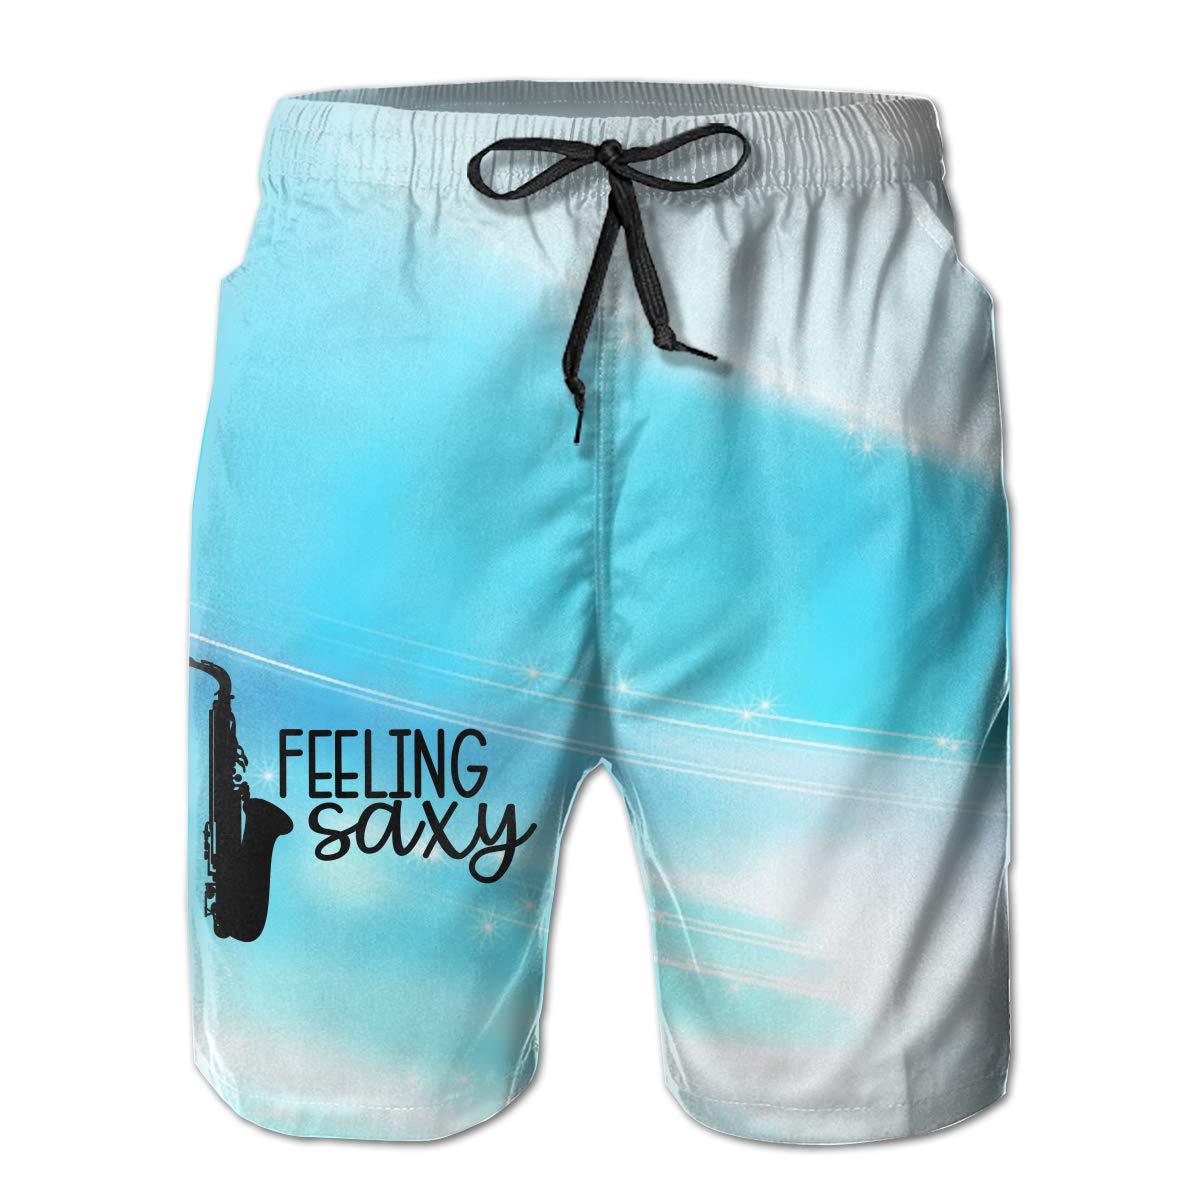 Feelin Saxy Saxophone Man Summer Casual Shorts,Beach Shorts Surf Shorts